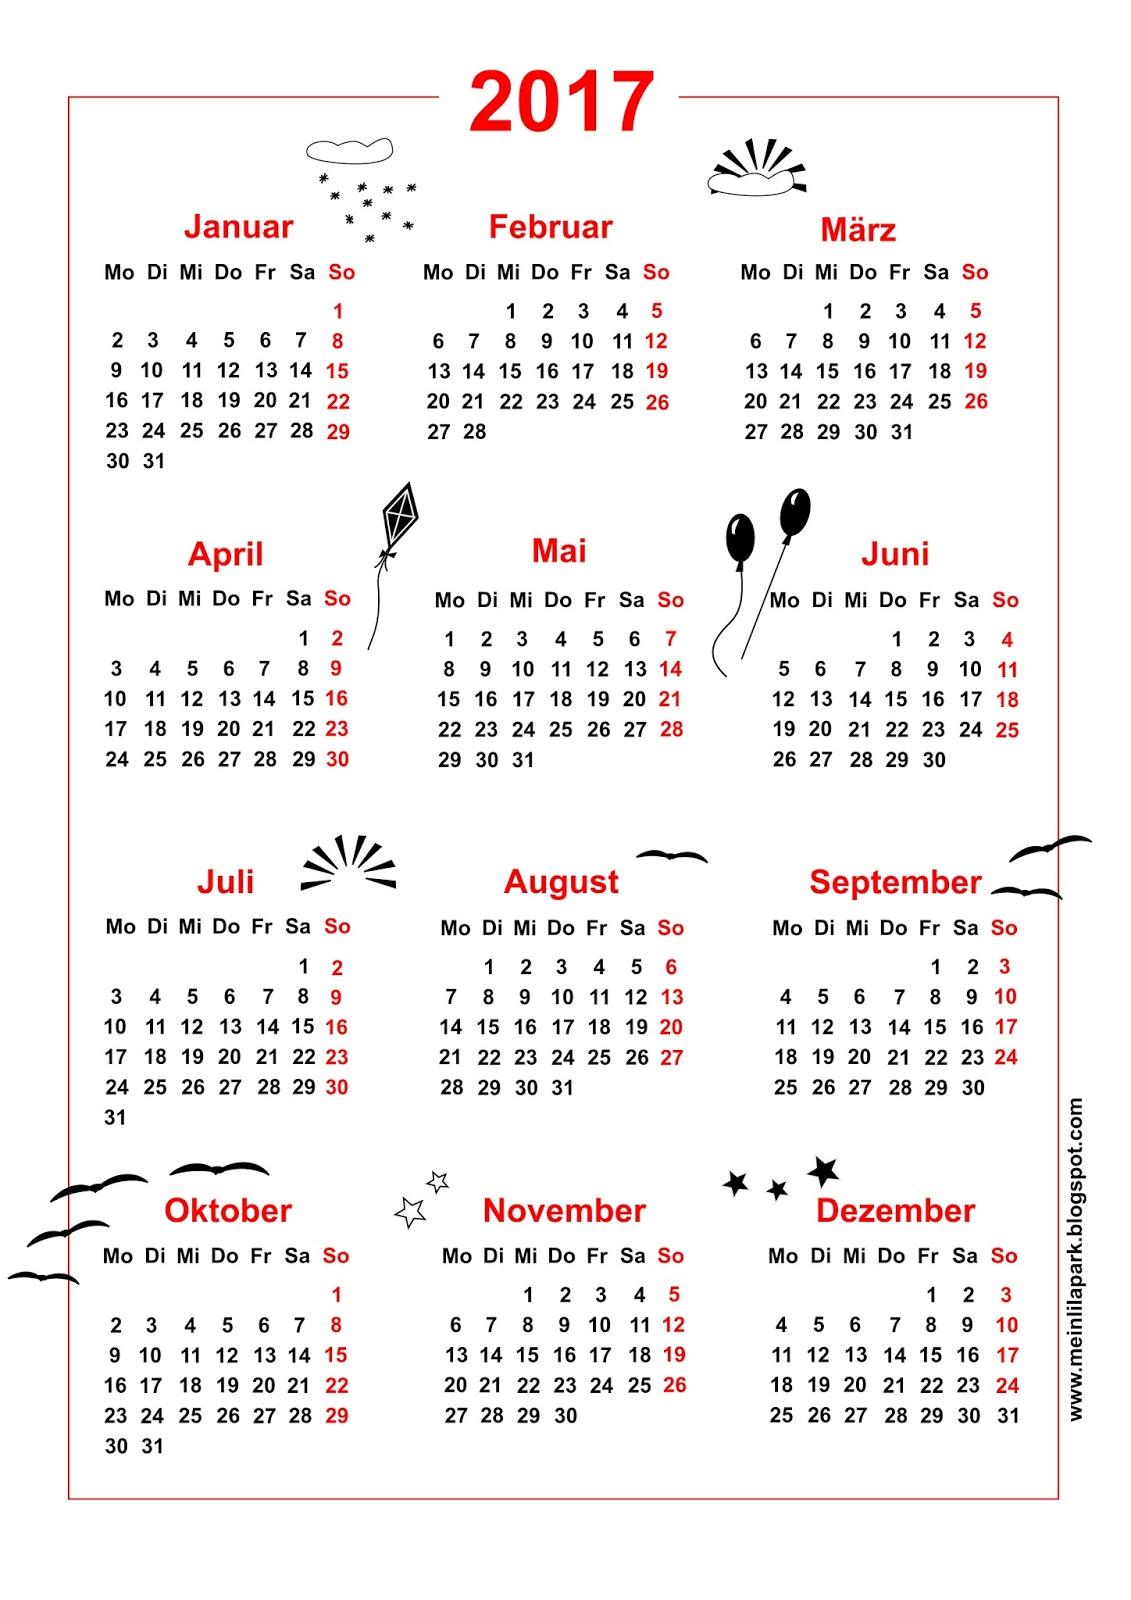 free printable 2017 cat calendar ausdruckbarer kalender freebie meinlilapark. Black Bedroom Furniture Sets. Home Design Ideas